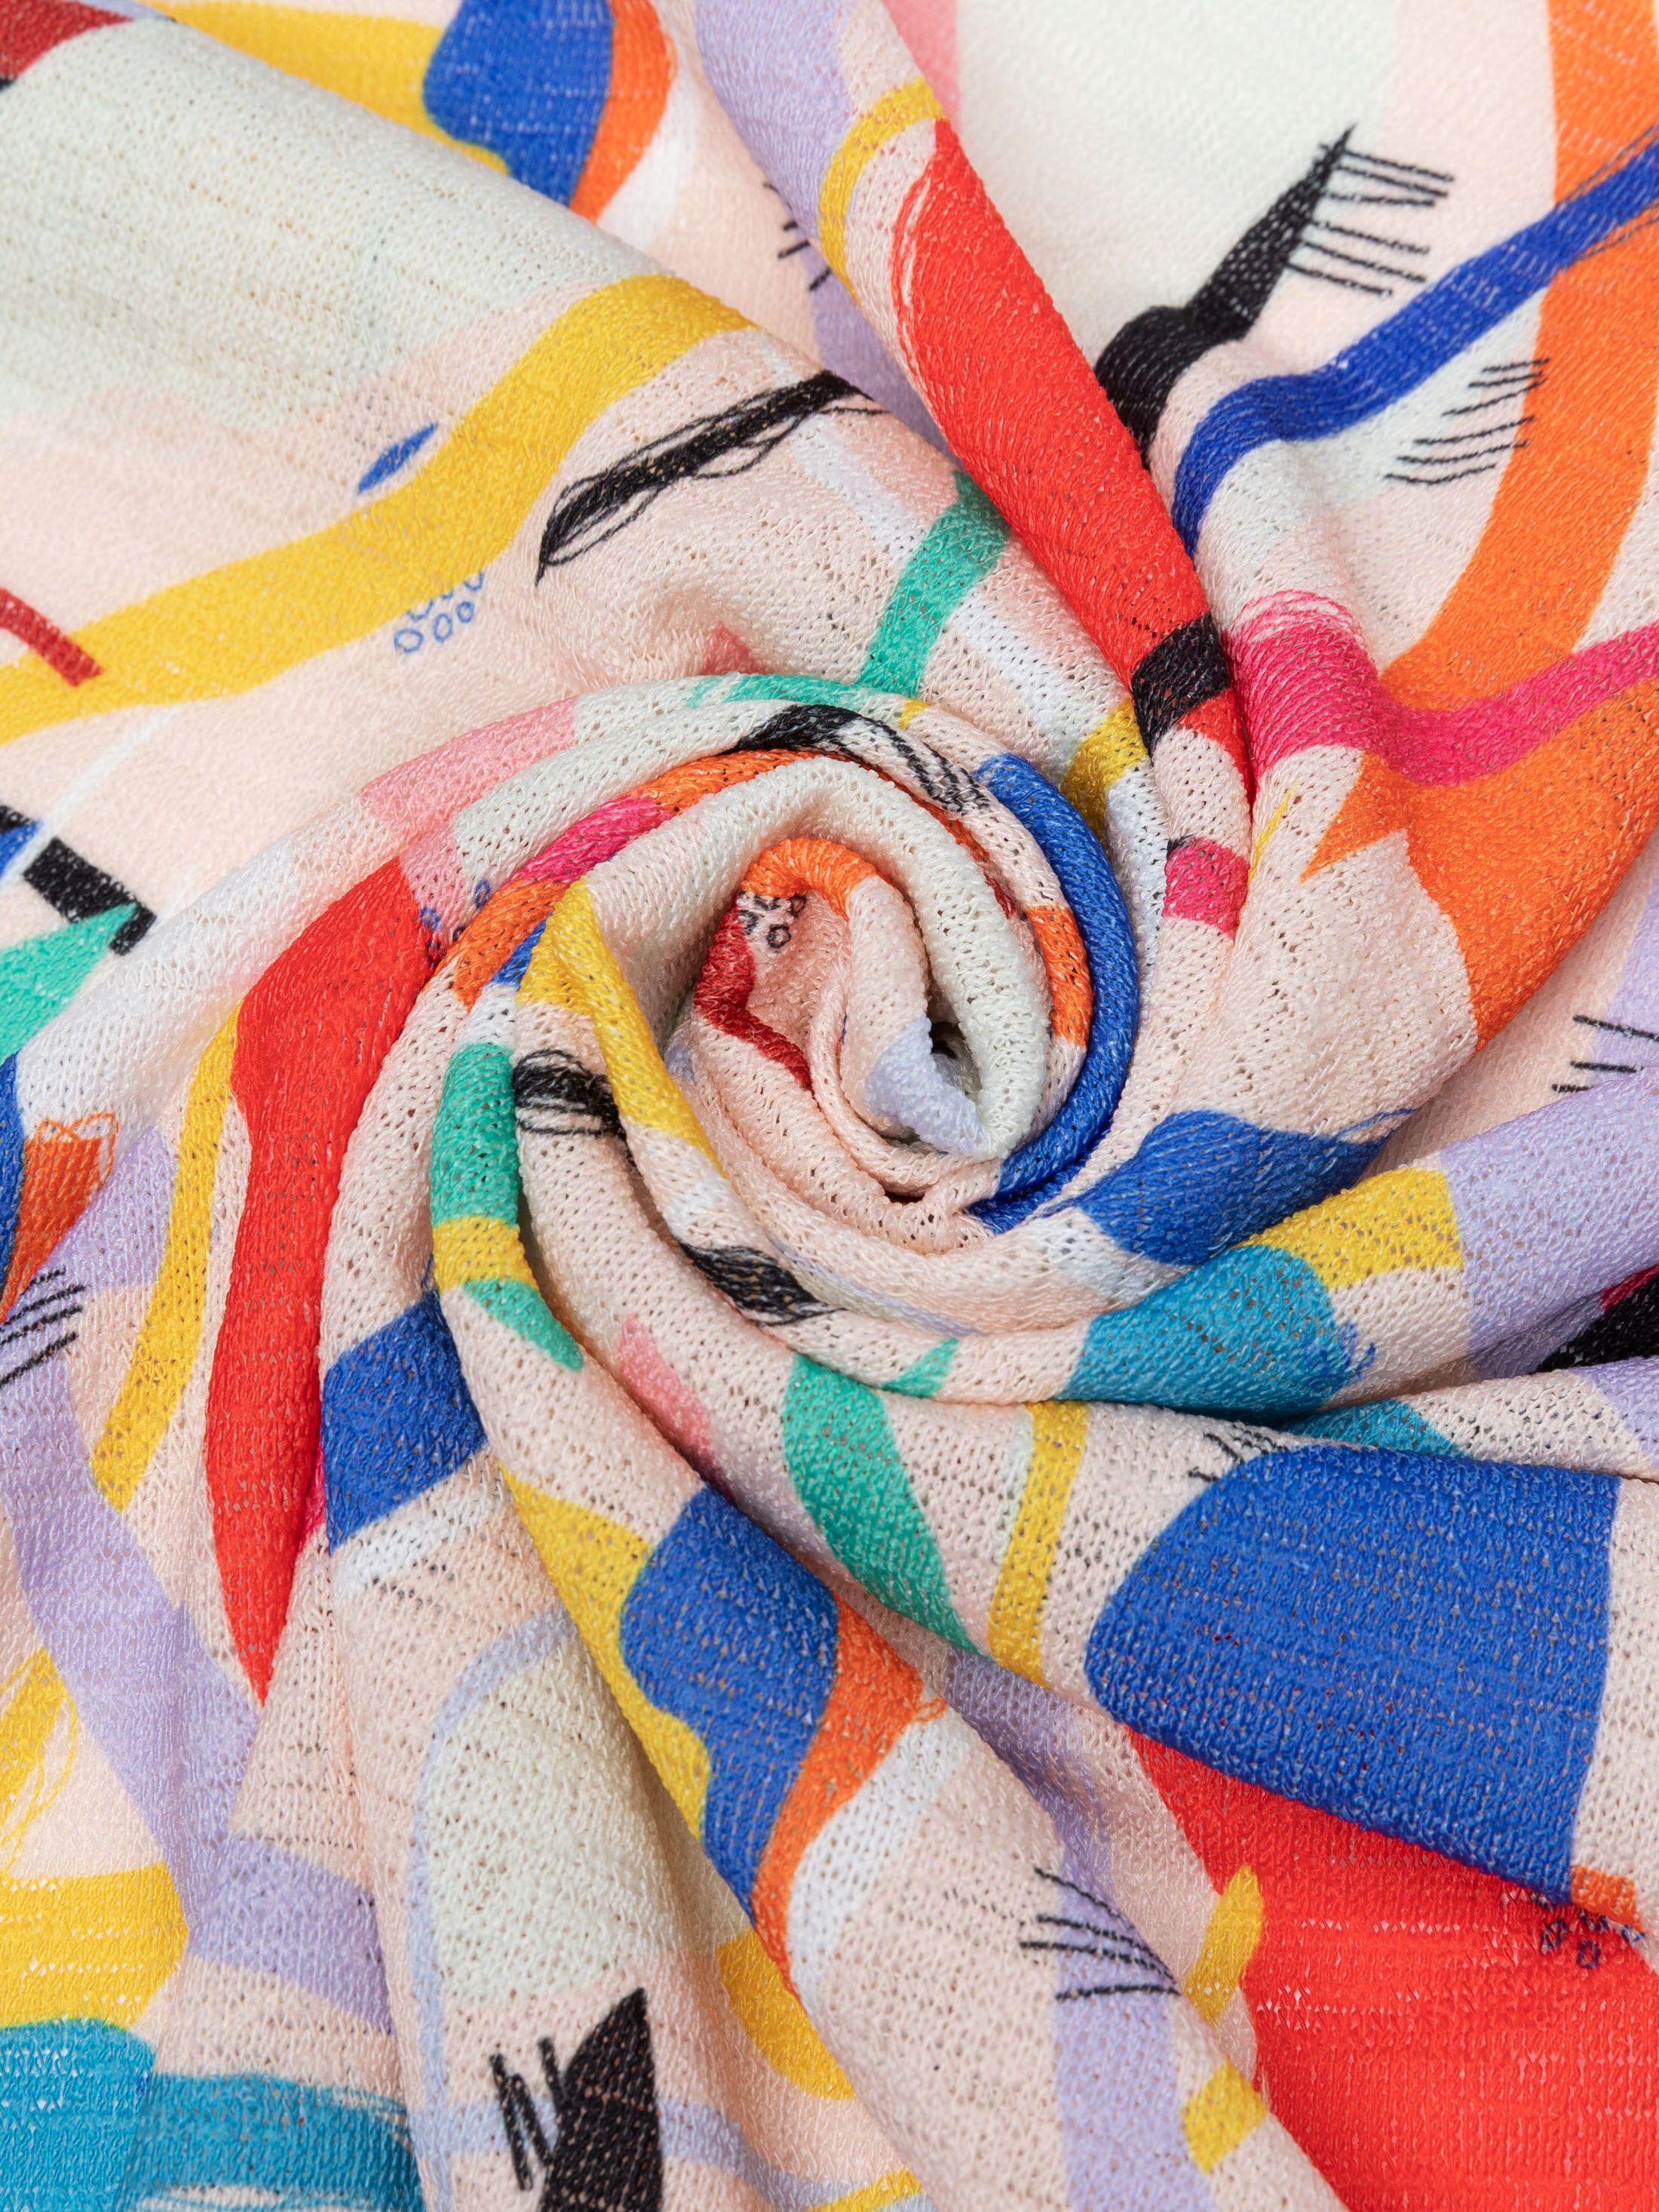 Loose knit fabric printing